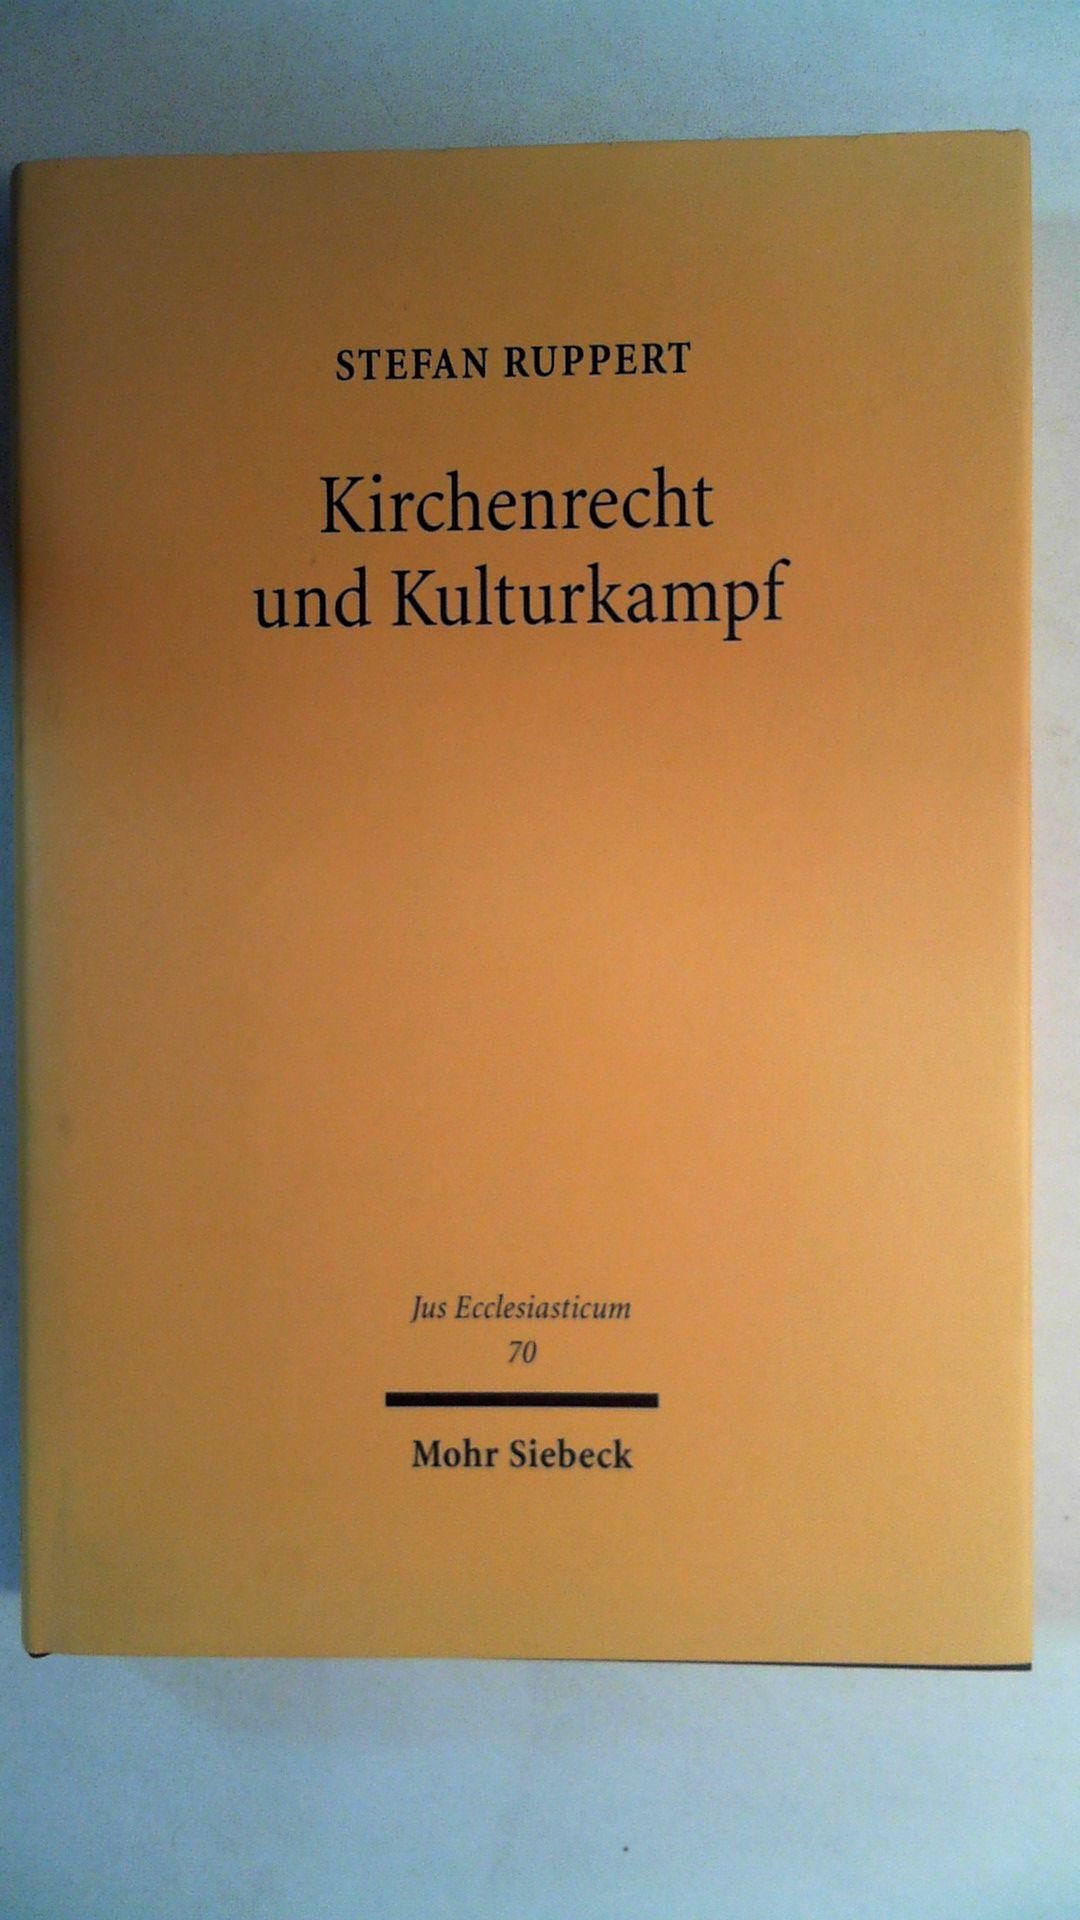 Kirchenrecht und Kulturkampf (Jus Ecclesiasticum, Band 70),  Auflage: 1. - Ruppert, Stefan